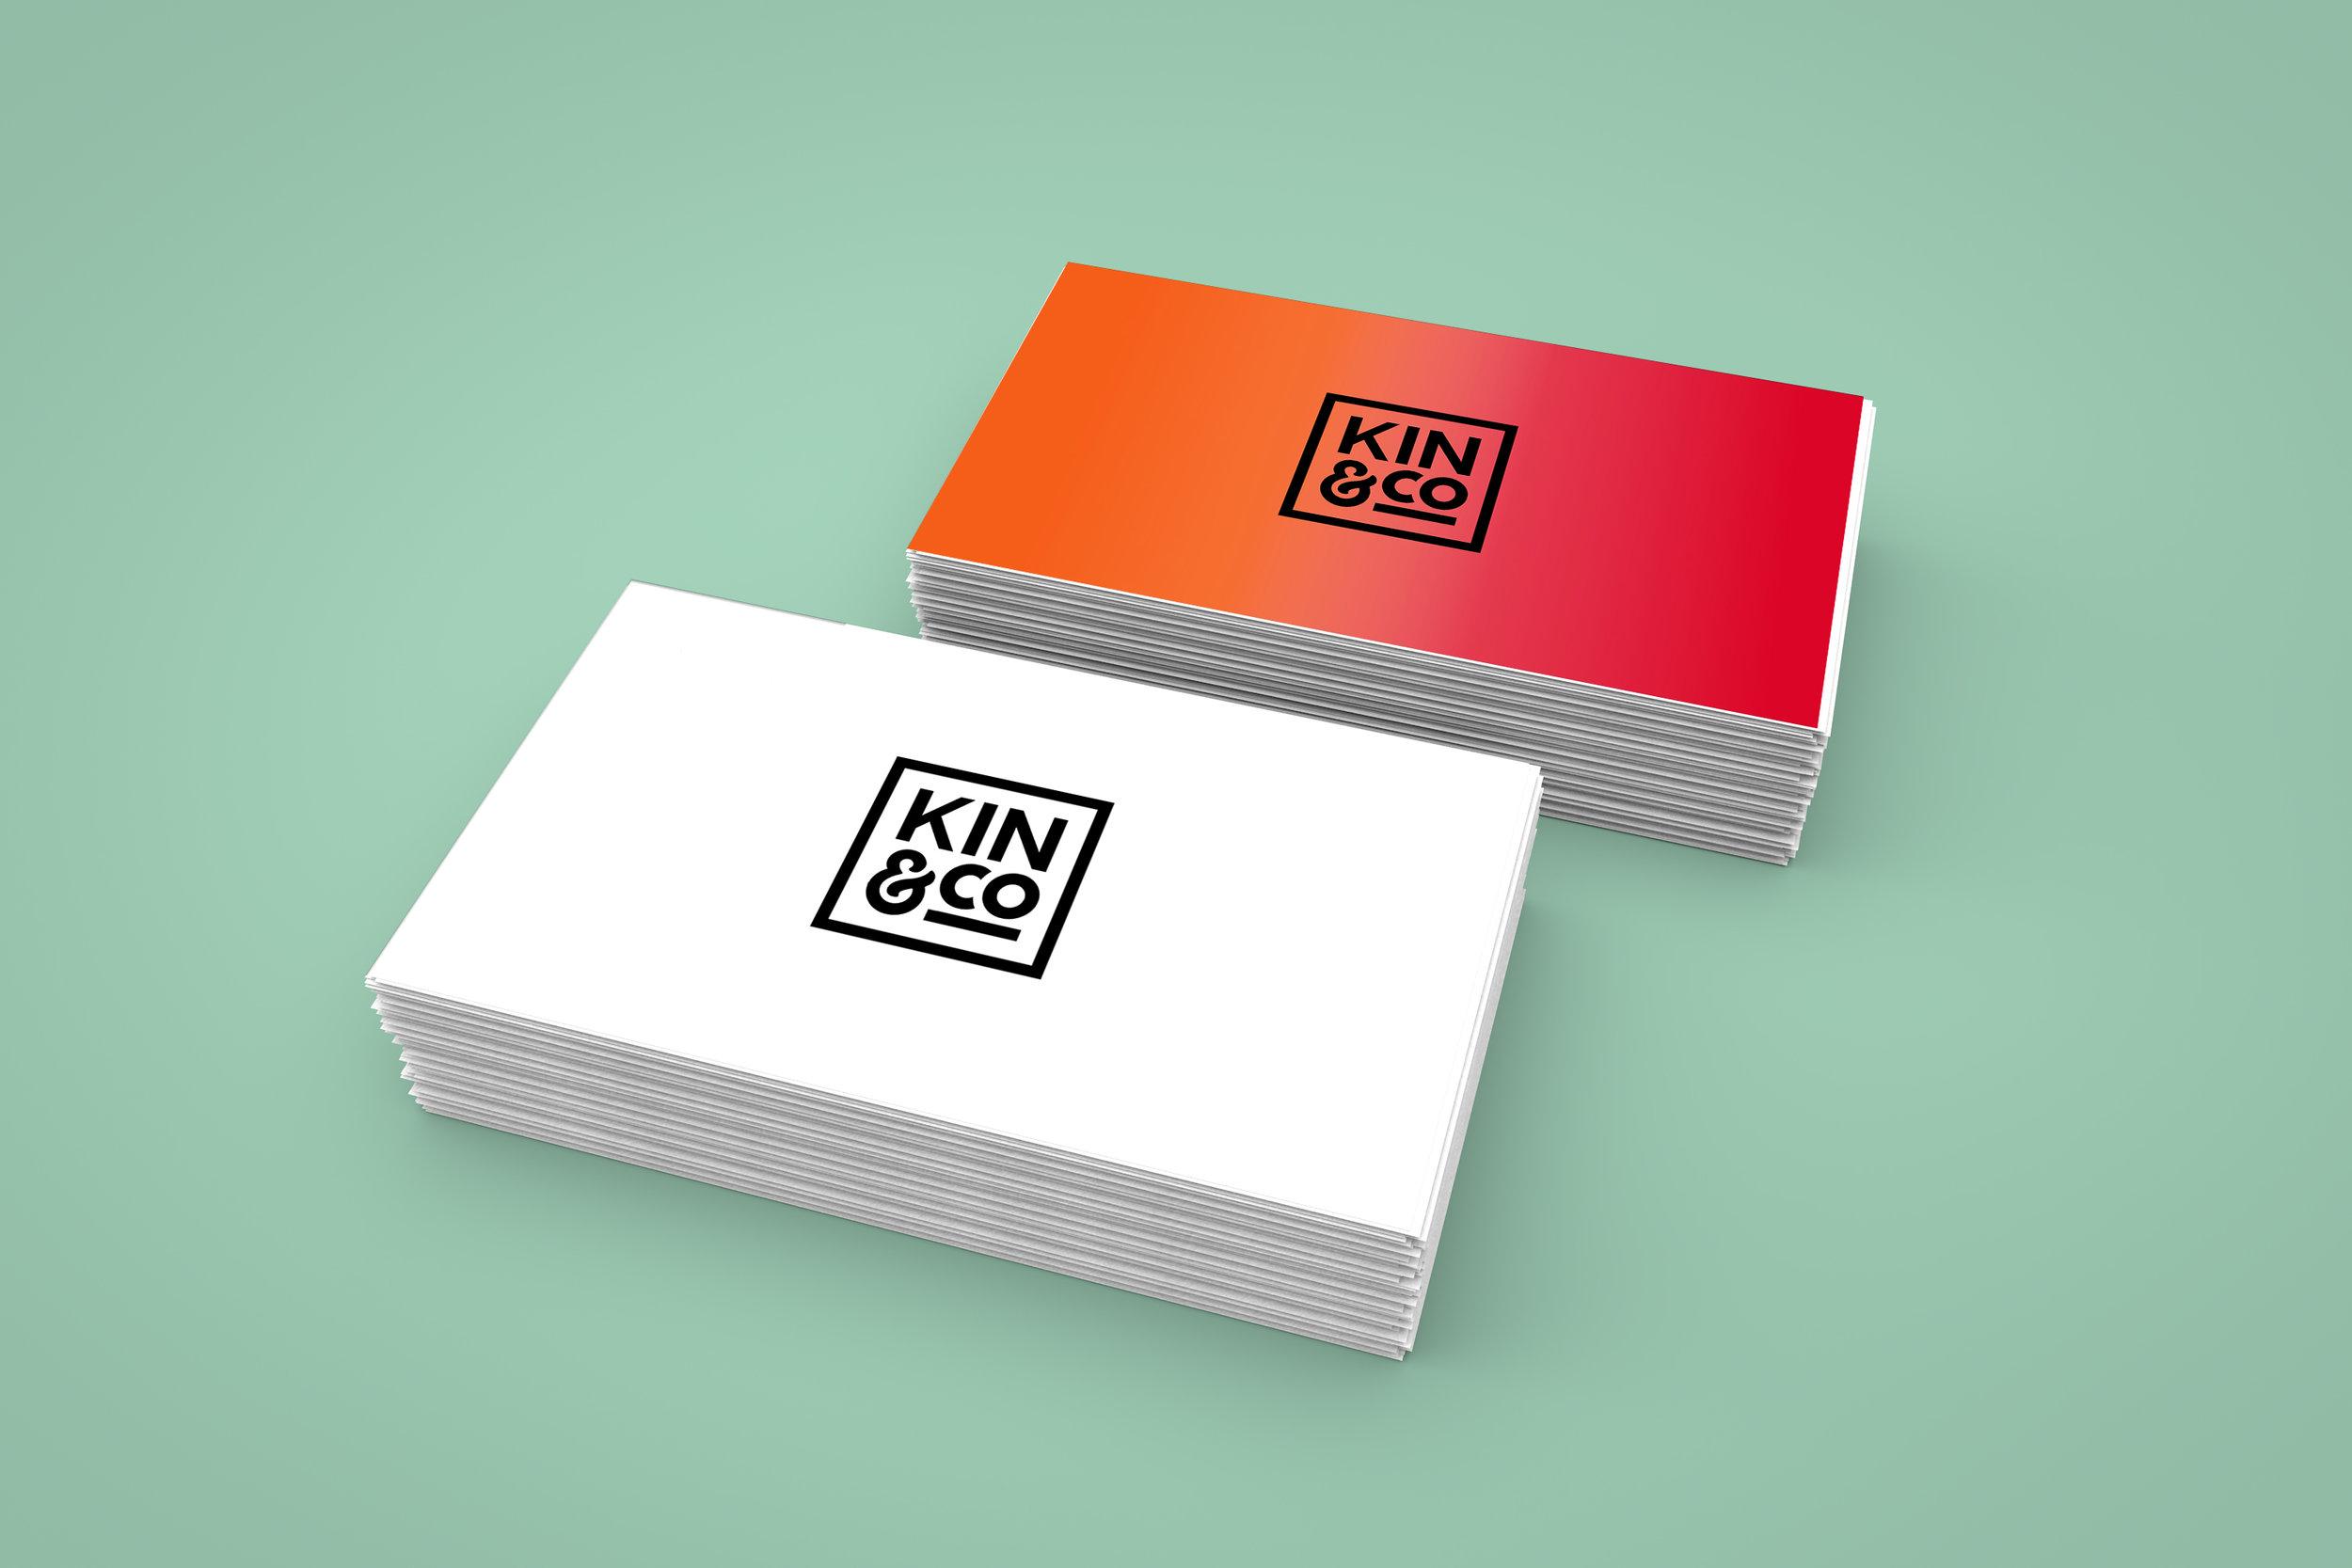 Kin&Co.jpg